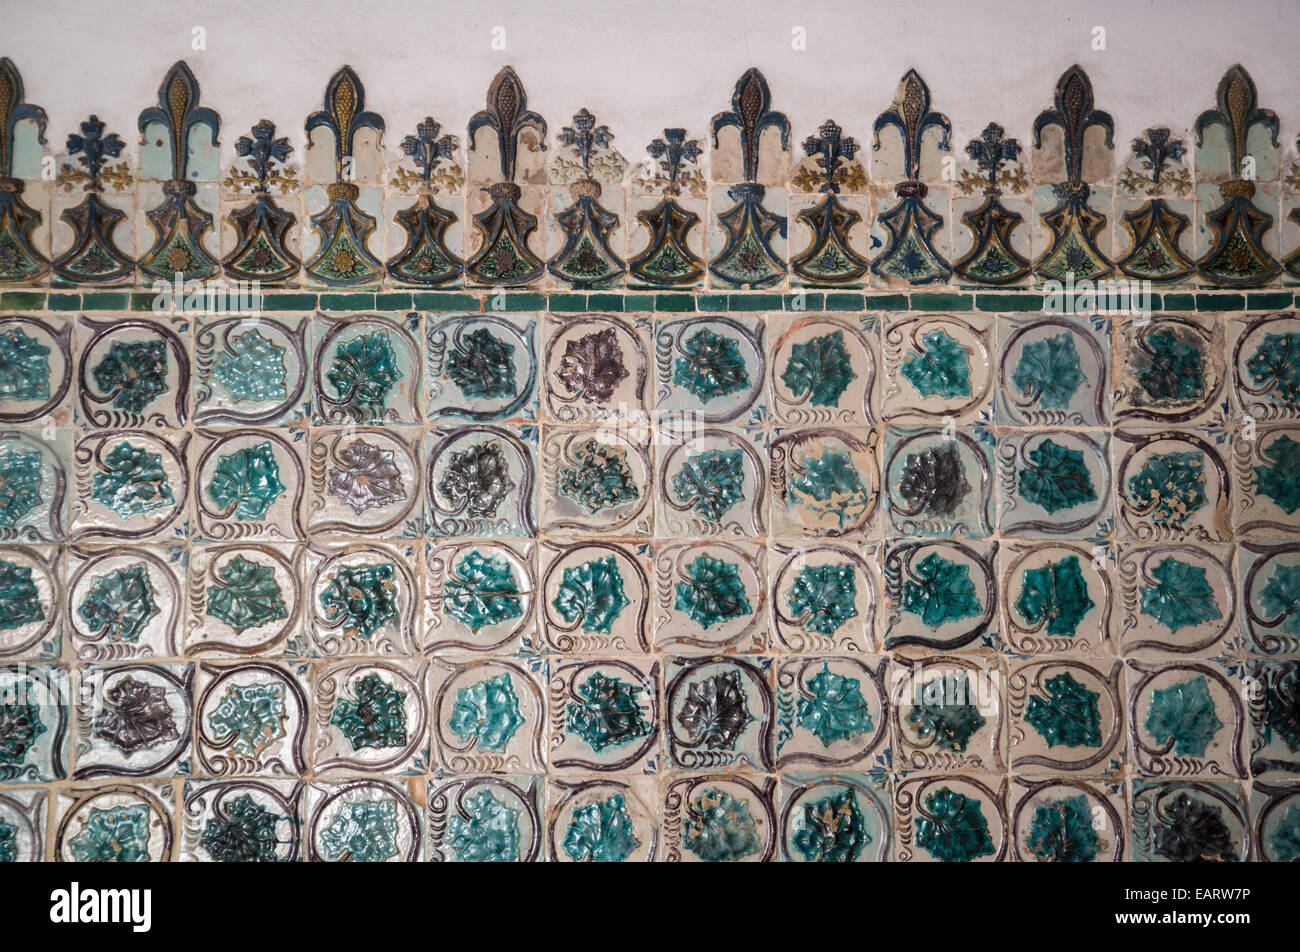 National Palace, Interior, Leaf Azulejos wall, Bedchamber of King Sebastian, Sintra, Portugal - Stock Image